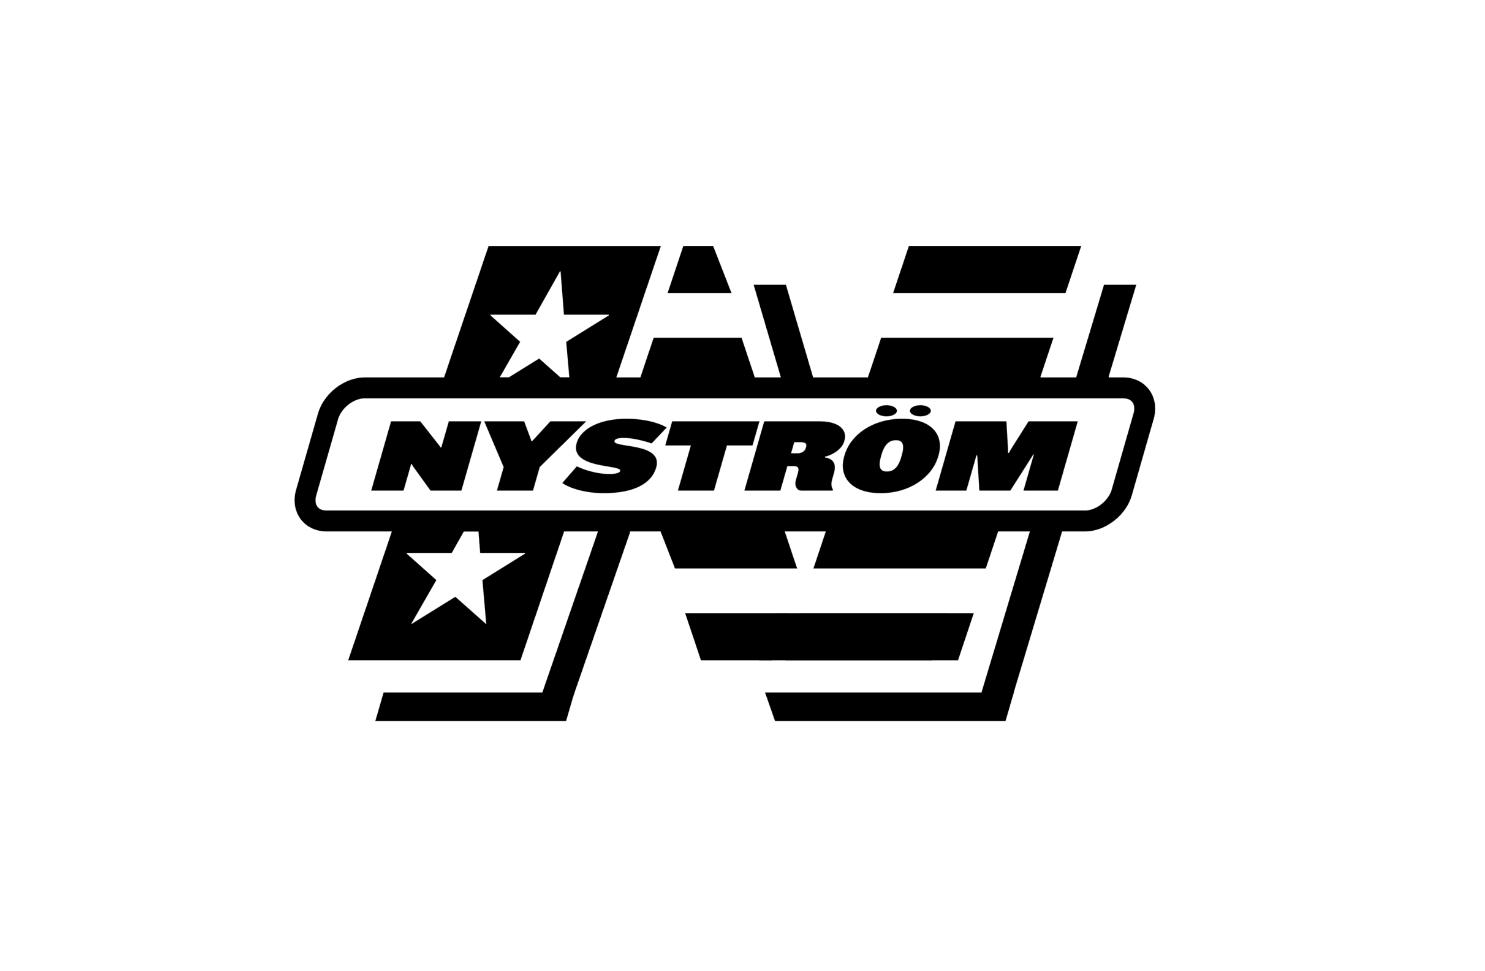 Nystrom_Workshop_36_edited